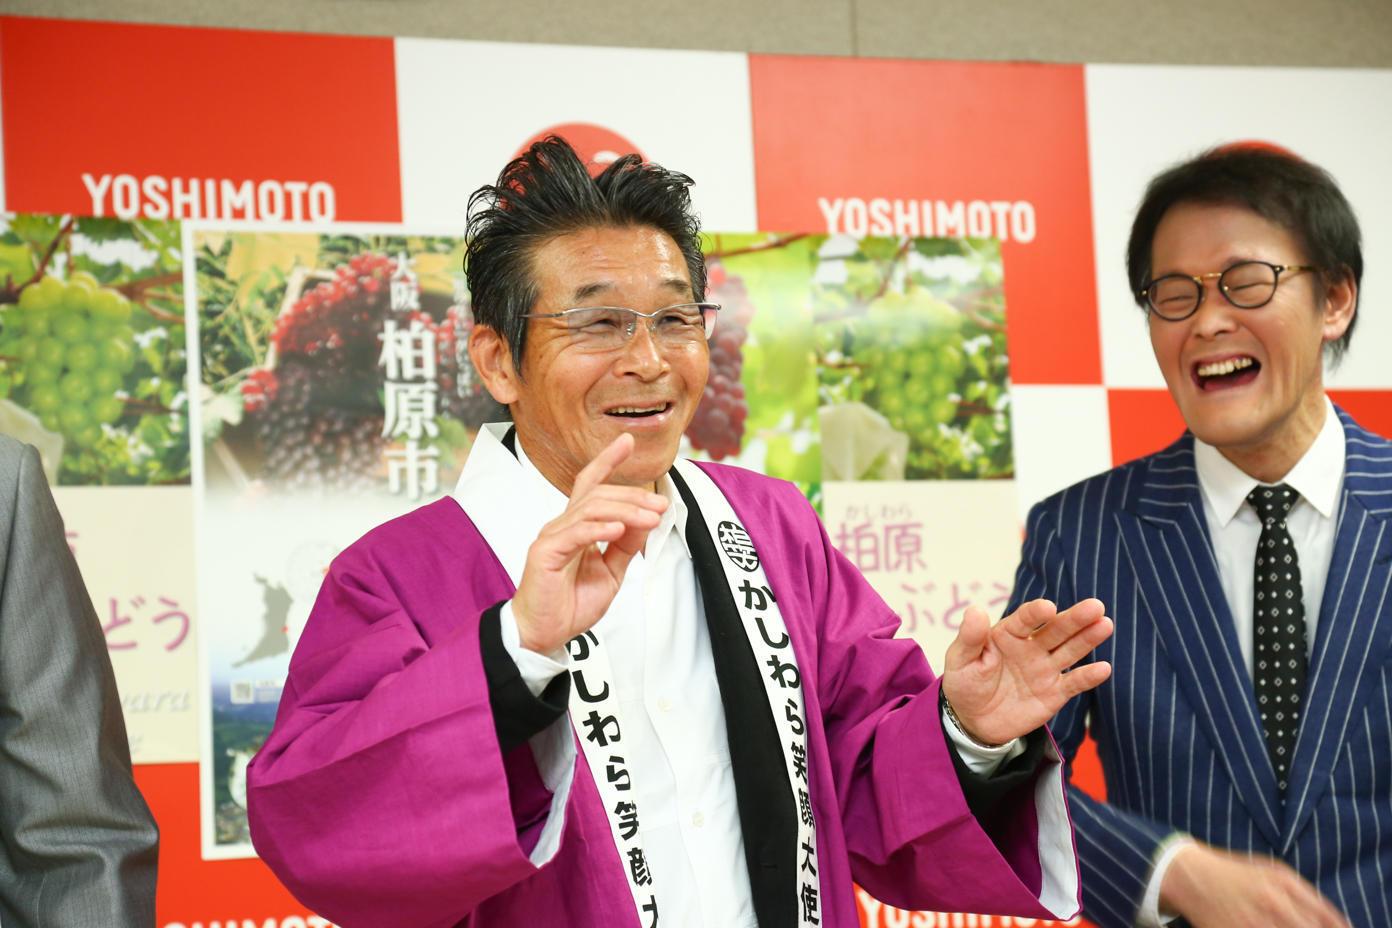 http://news.yoshimoto.co.jp/20171130213214-0083704b89e129189c60a00dbe267d75ce05e5c9.jpg